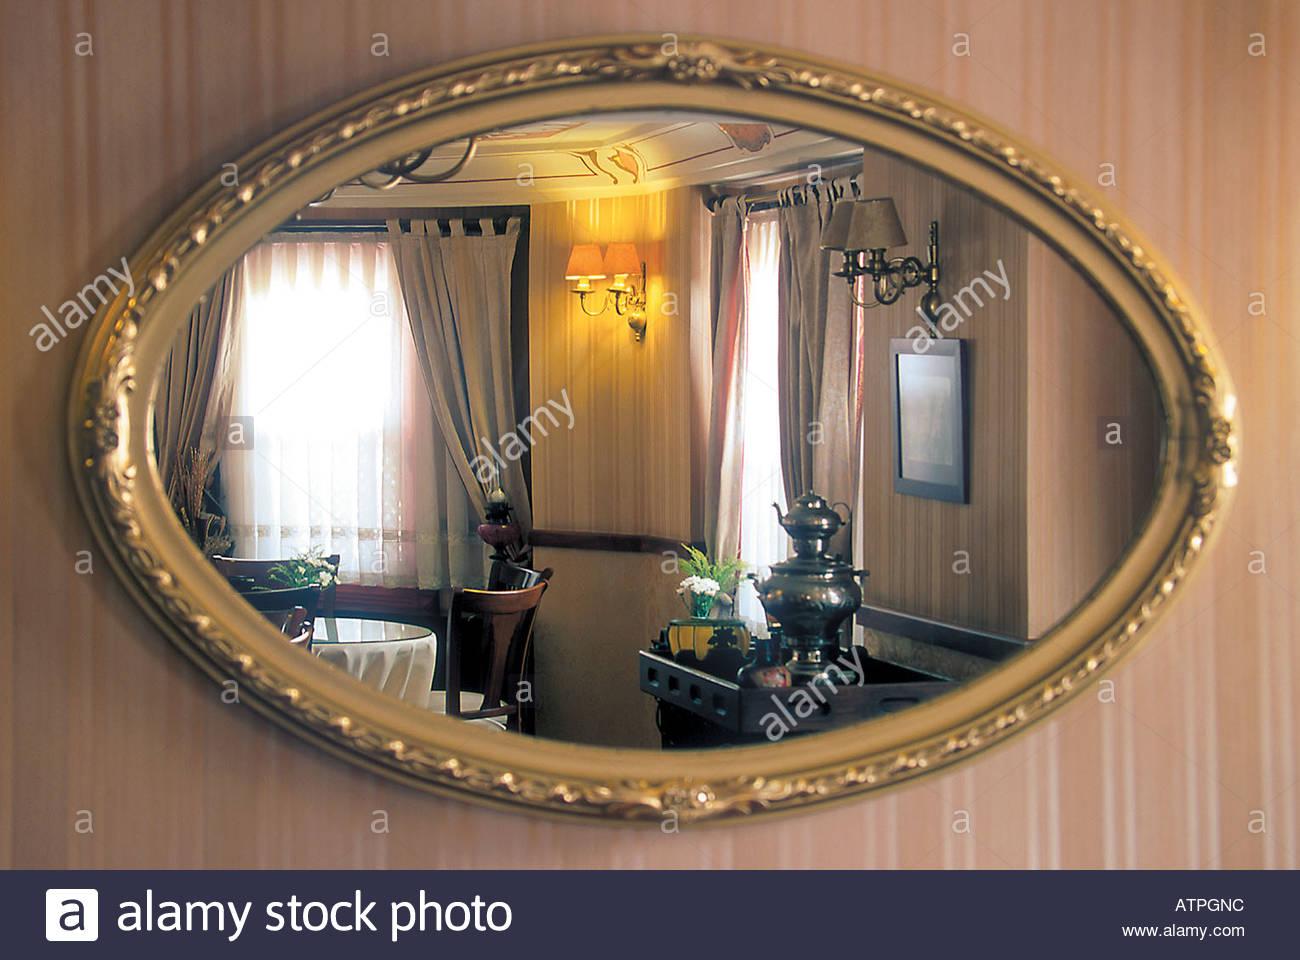 lambrequin stockfotos lambrequin bilder alamy. Black Bedroom Furniture Sets. Home Design Ideas